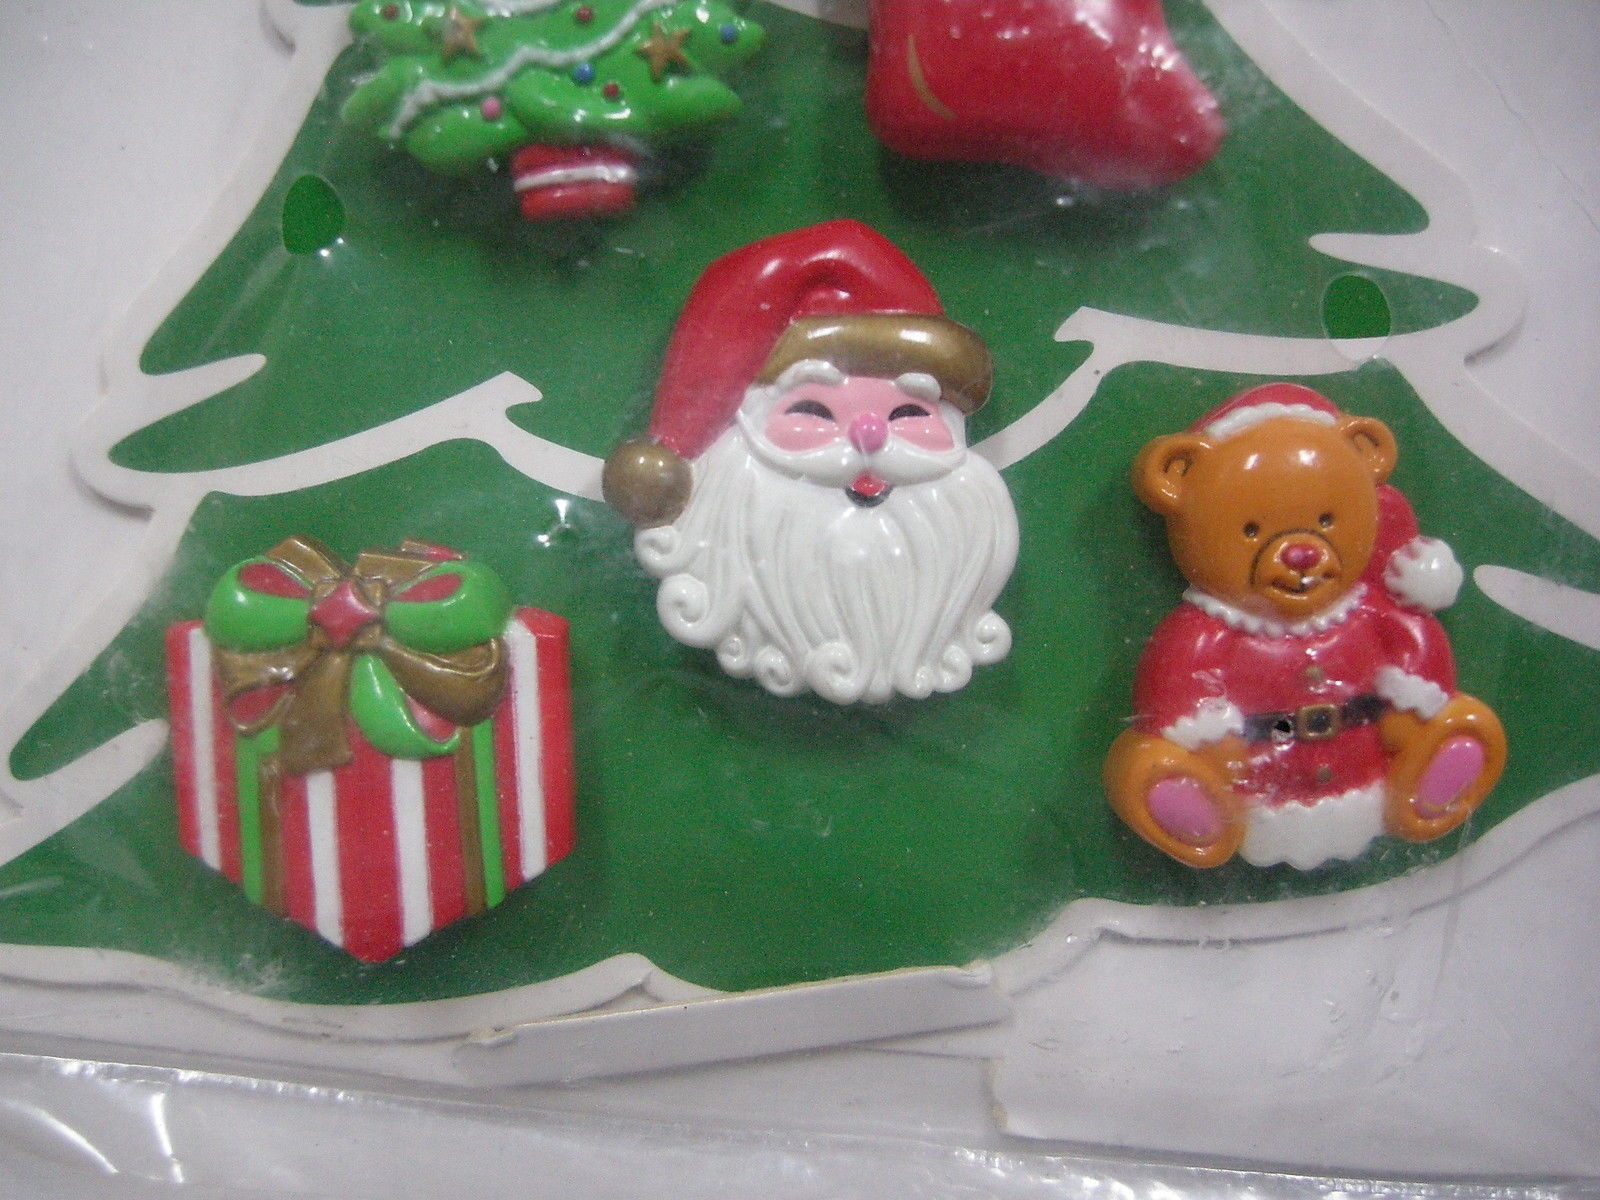 Christmas Novelty Button Cover Avon 12 Tree Stocking Present Snowman Santa Bear